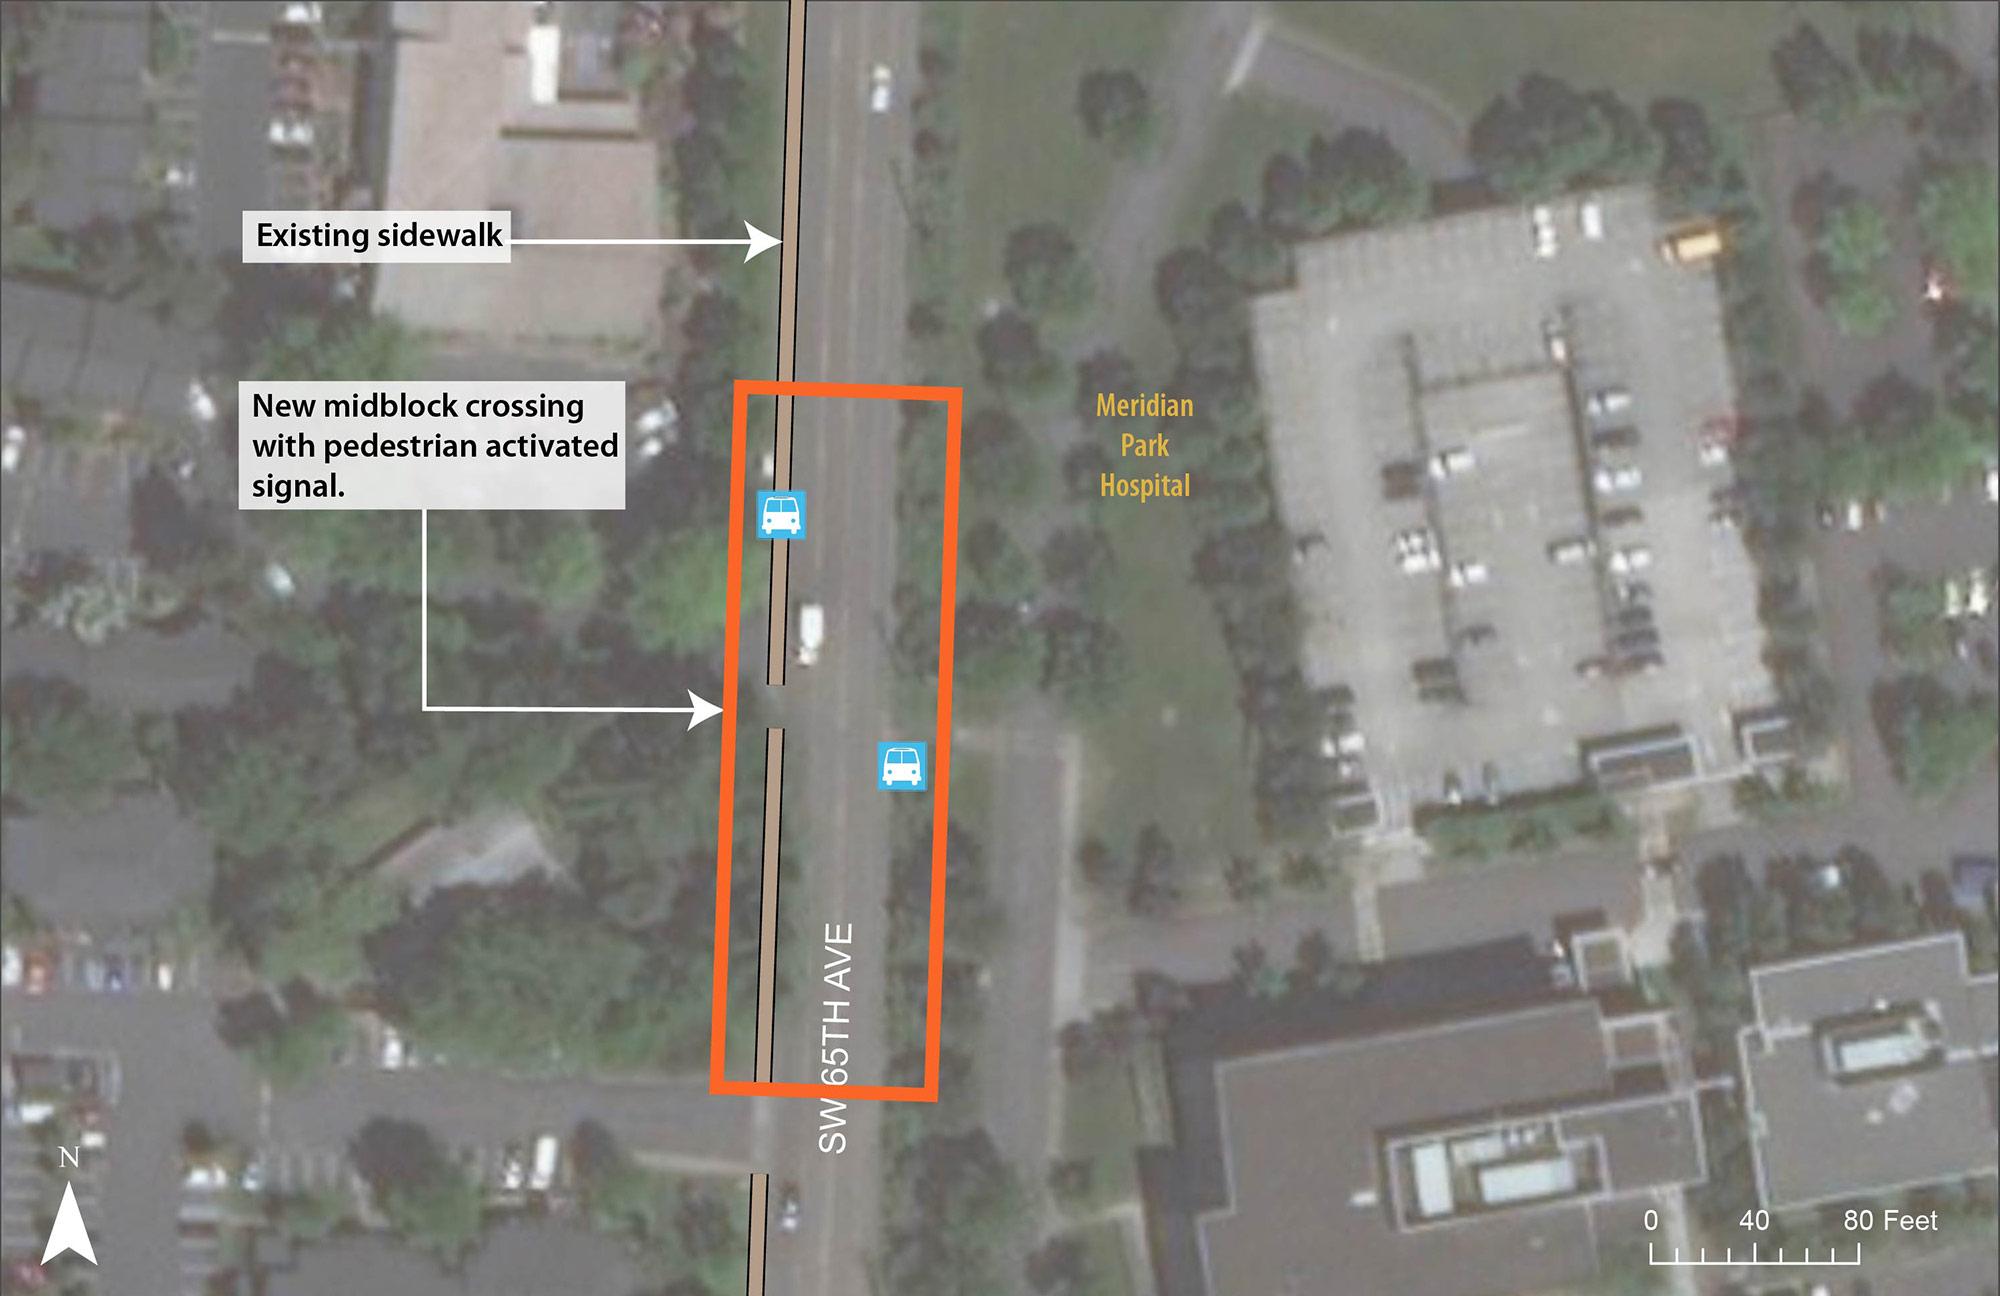 65th_Meridian_Park_Hospital-Map-072320-